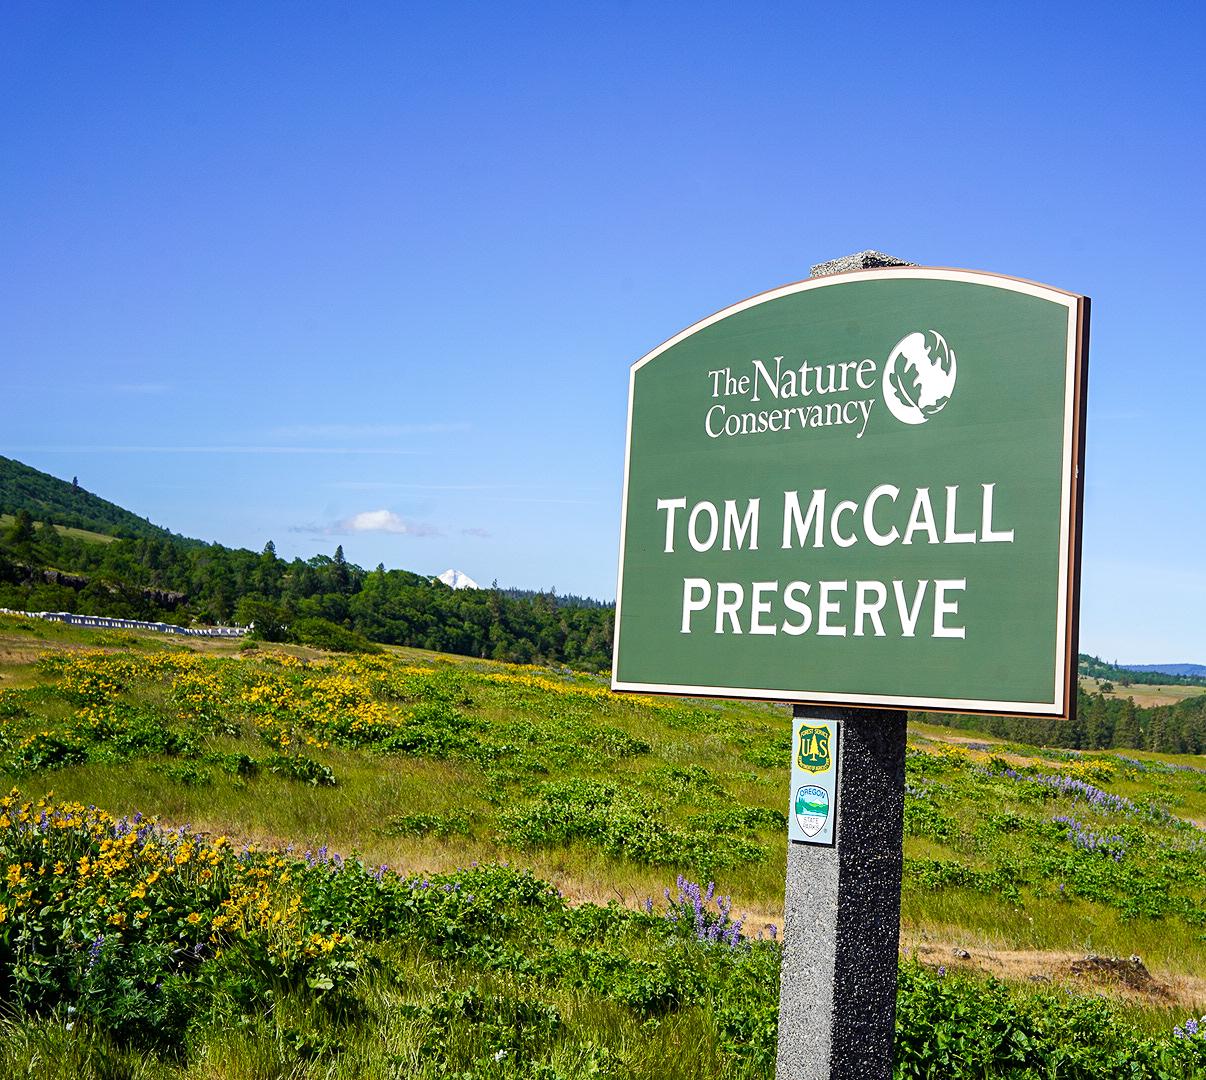 Tom McCall Preserve